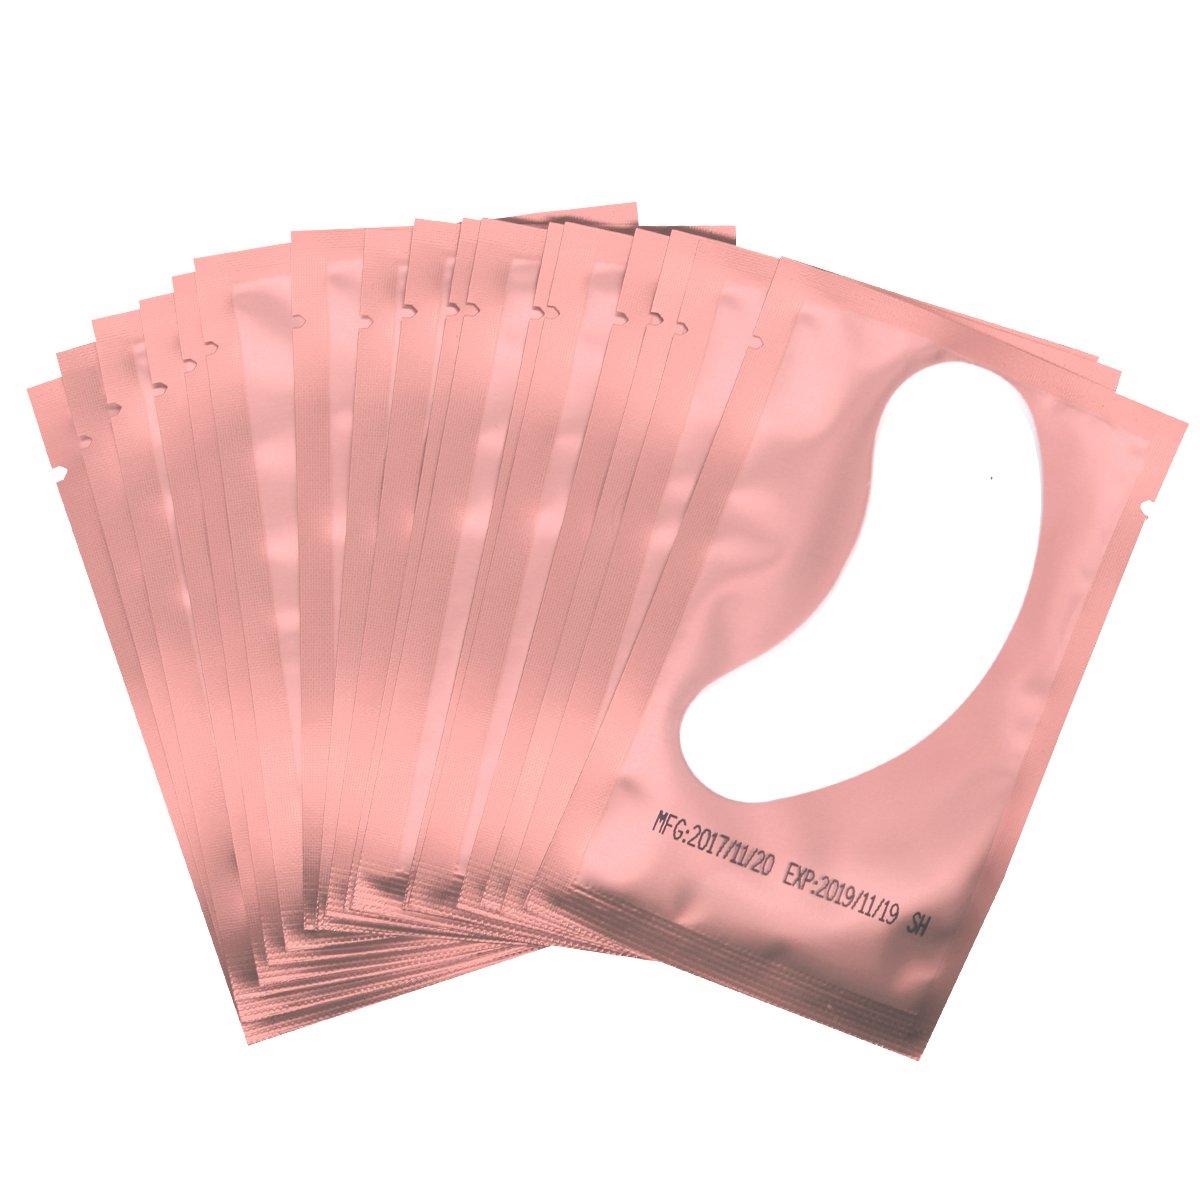 Eye Gel Pads - 100 Pairs of Eyelash Lash Extension Under Eye Gel Pads Lint Eye Patches (pink100)